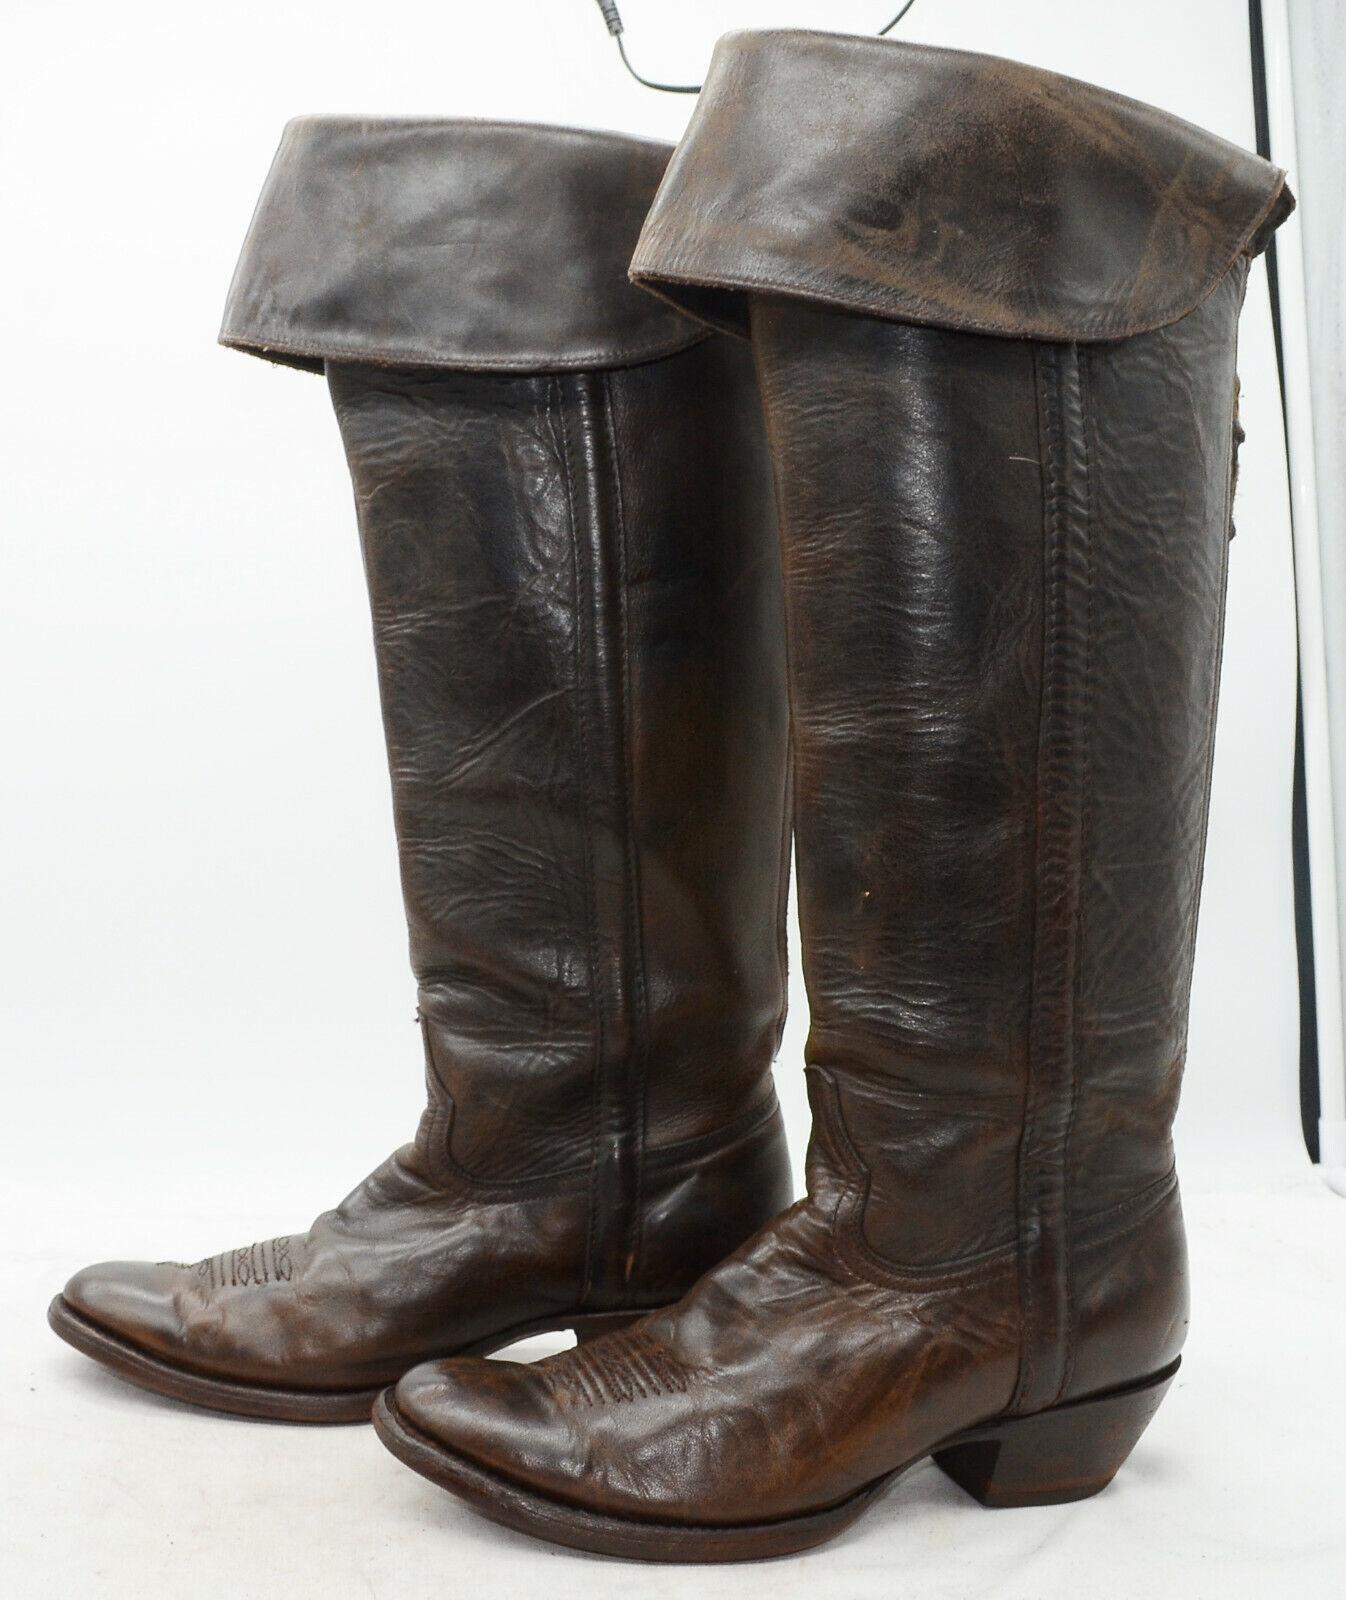 Charlie 1 Horse damen Sz 9 Cuffed Leather Knee High Ride Western Stiefel Back Zip